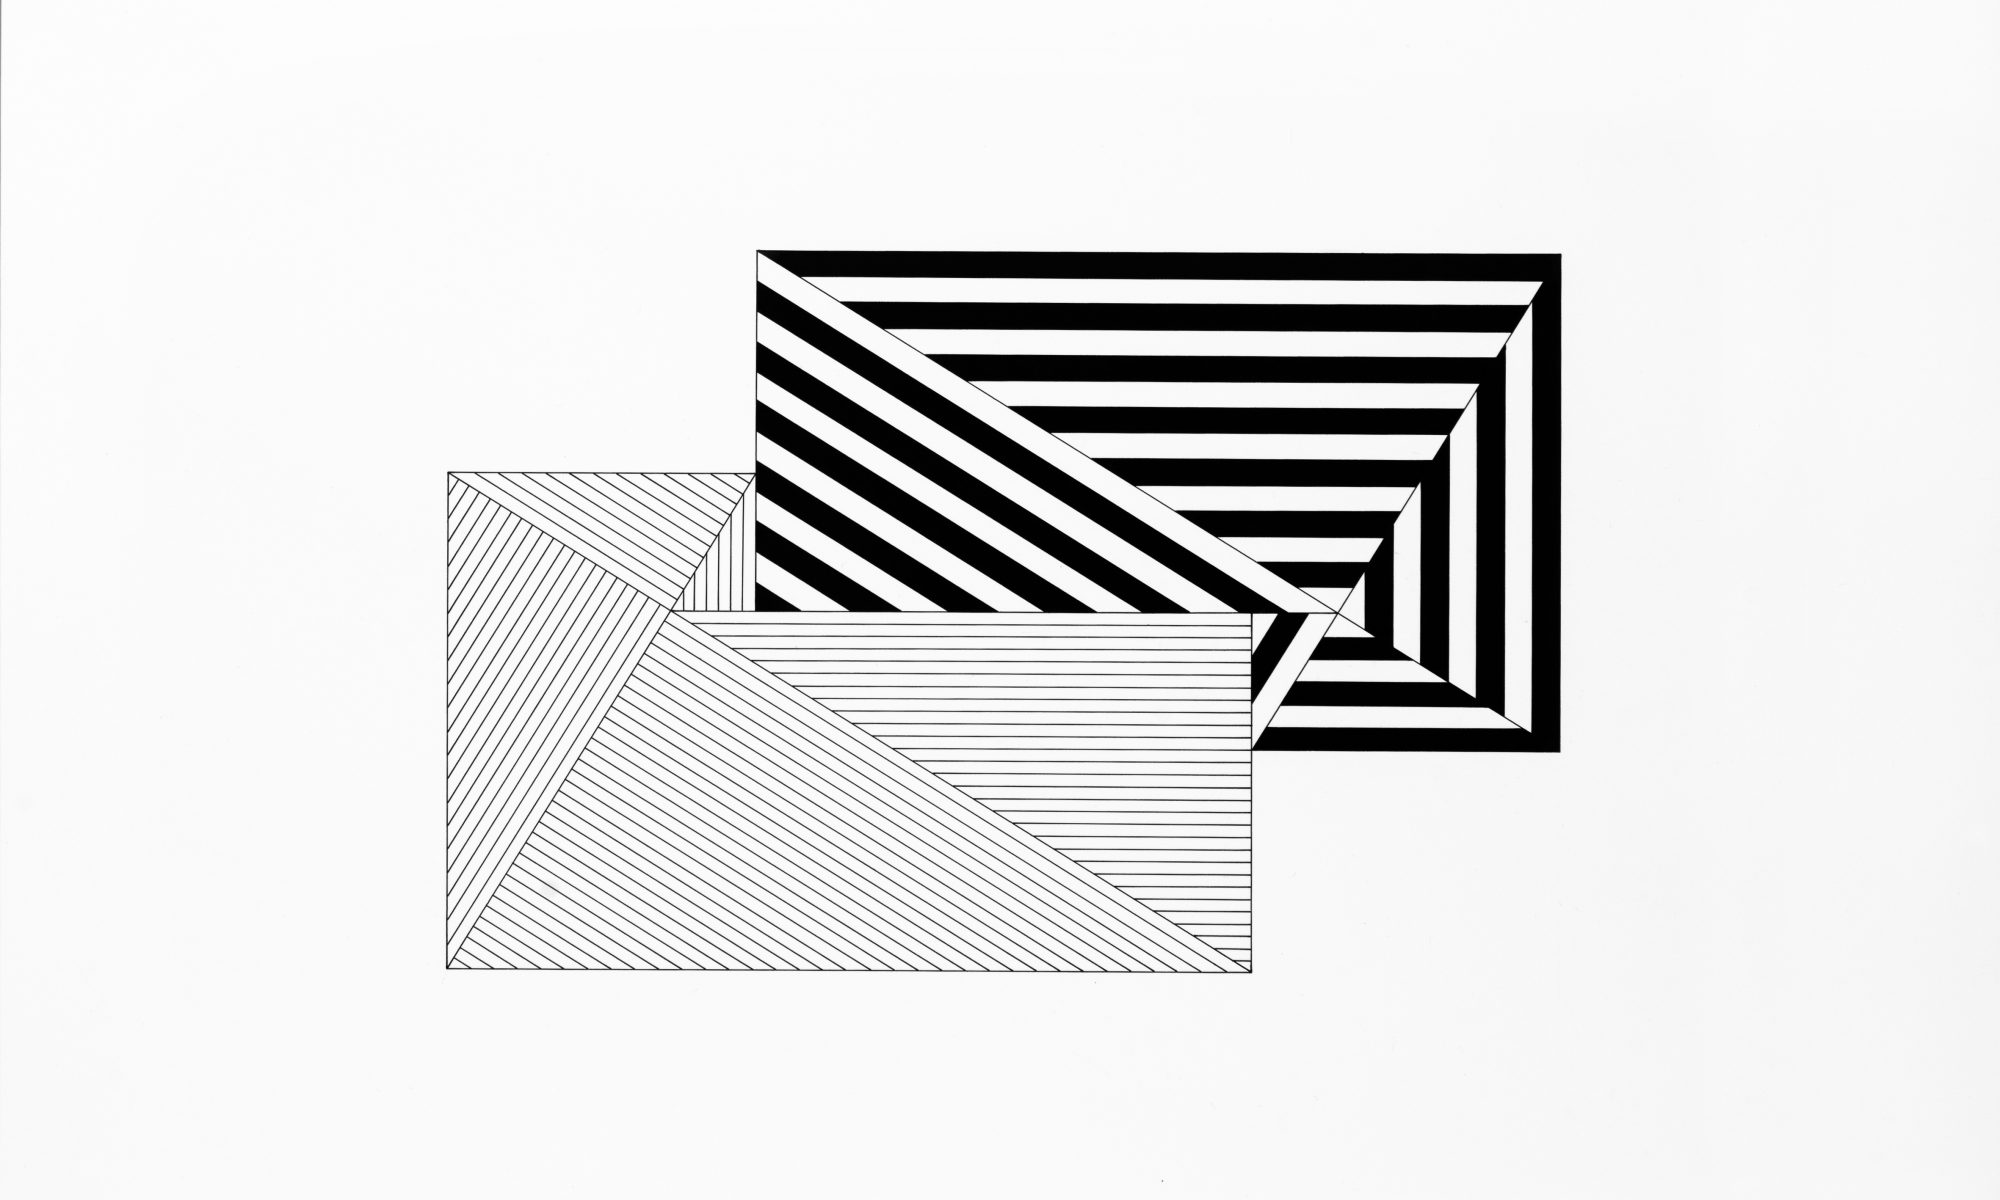 Konstruktive Kunst | Gerhard Daum